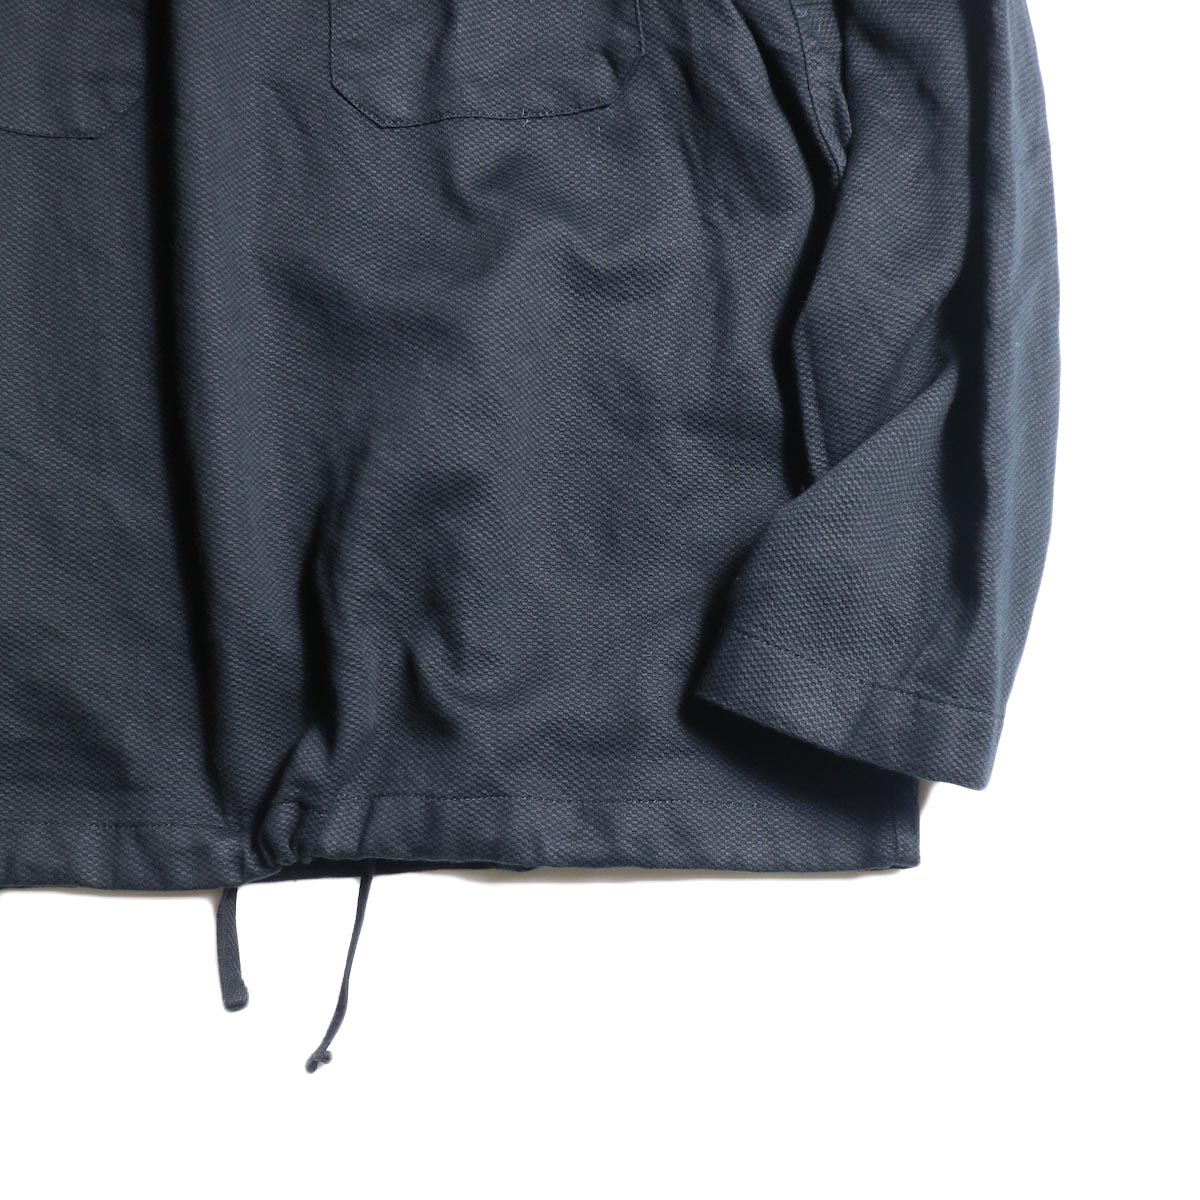 Engineered Garments / Cagoule Shirt -Waffle Pique (Black)袖、裾